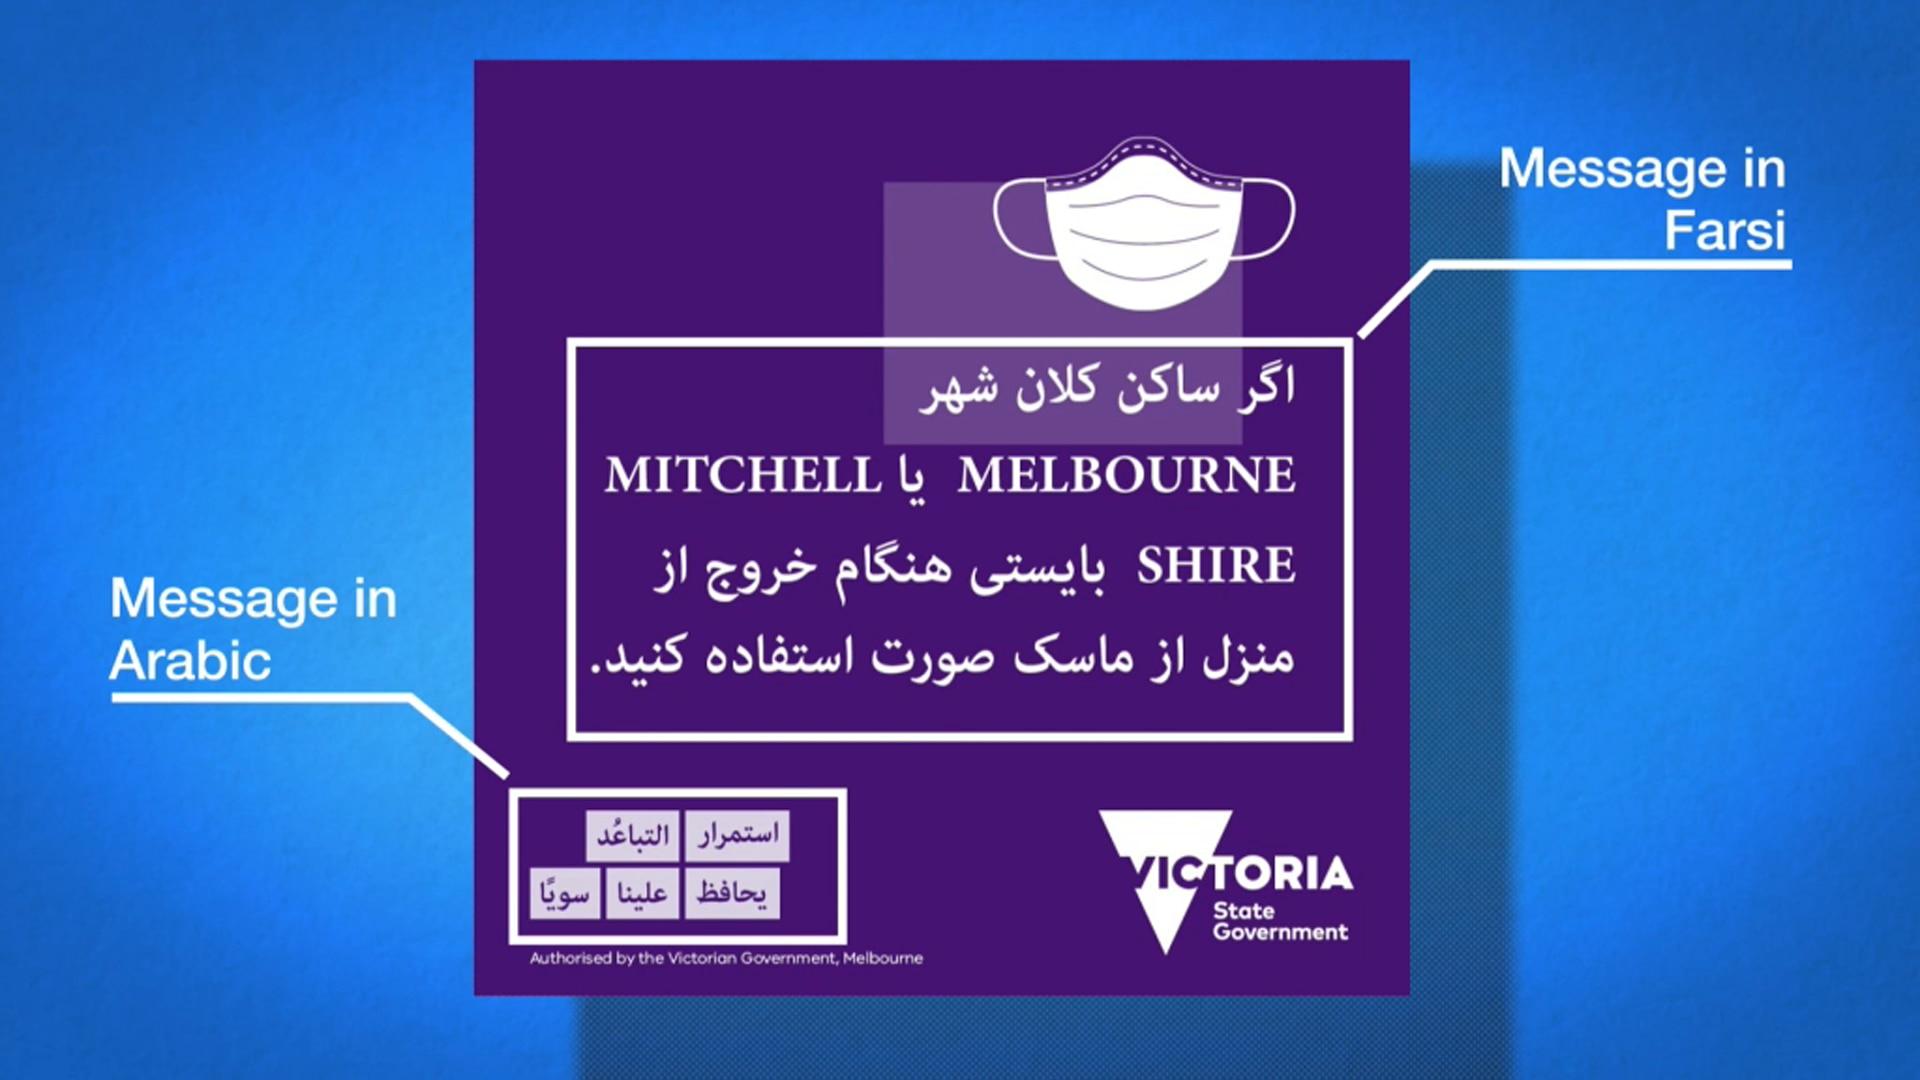 Victoria message